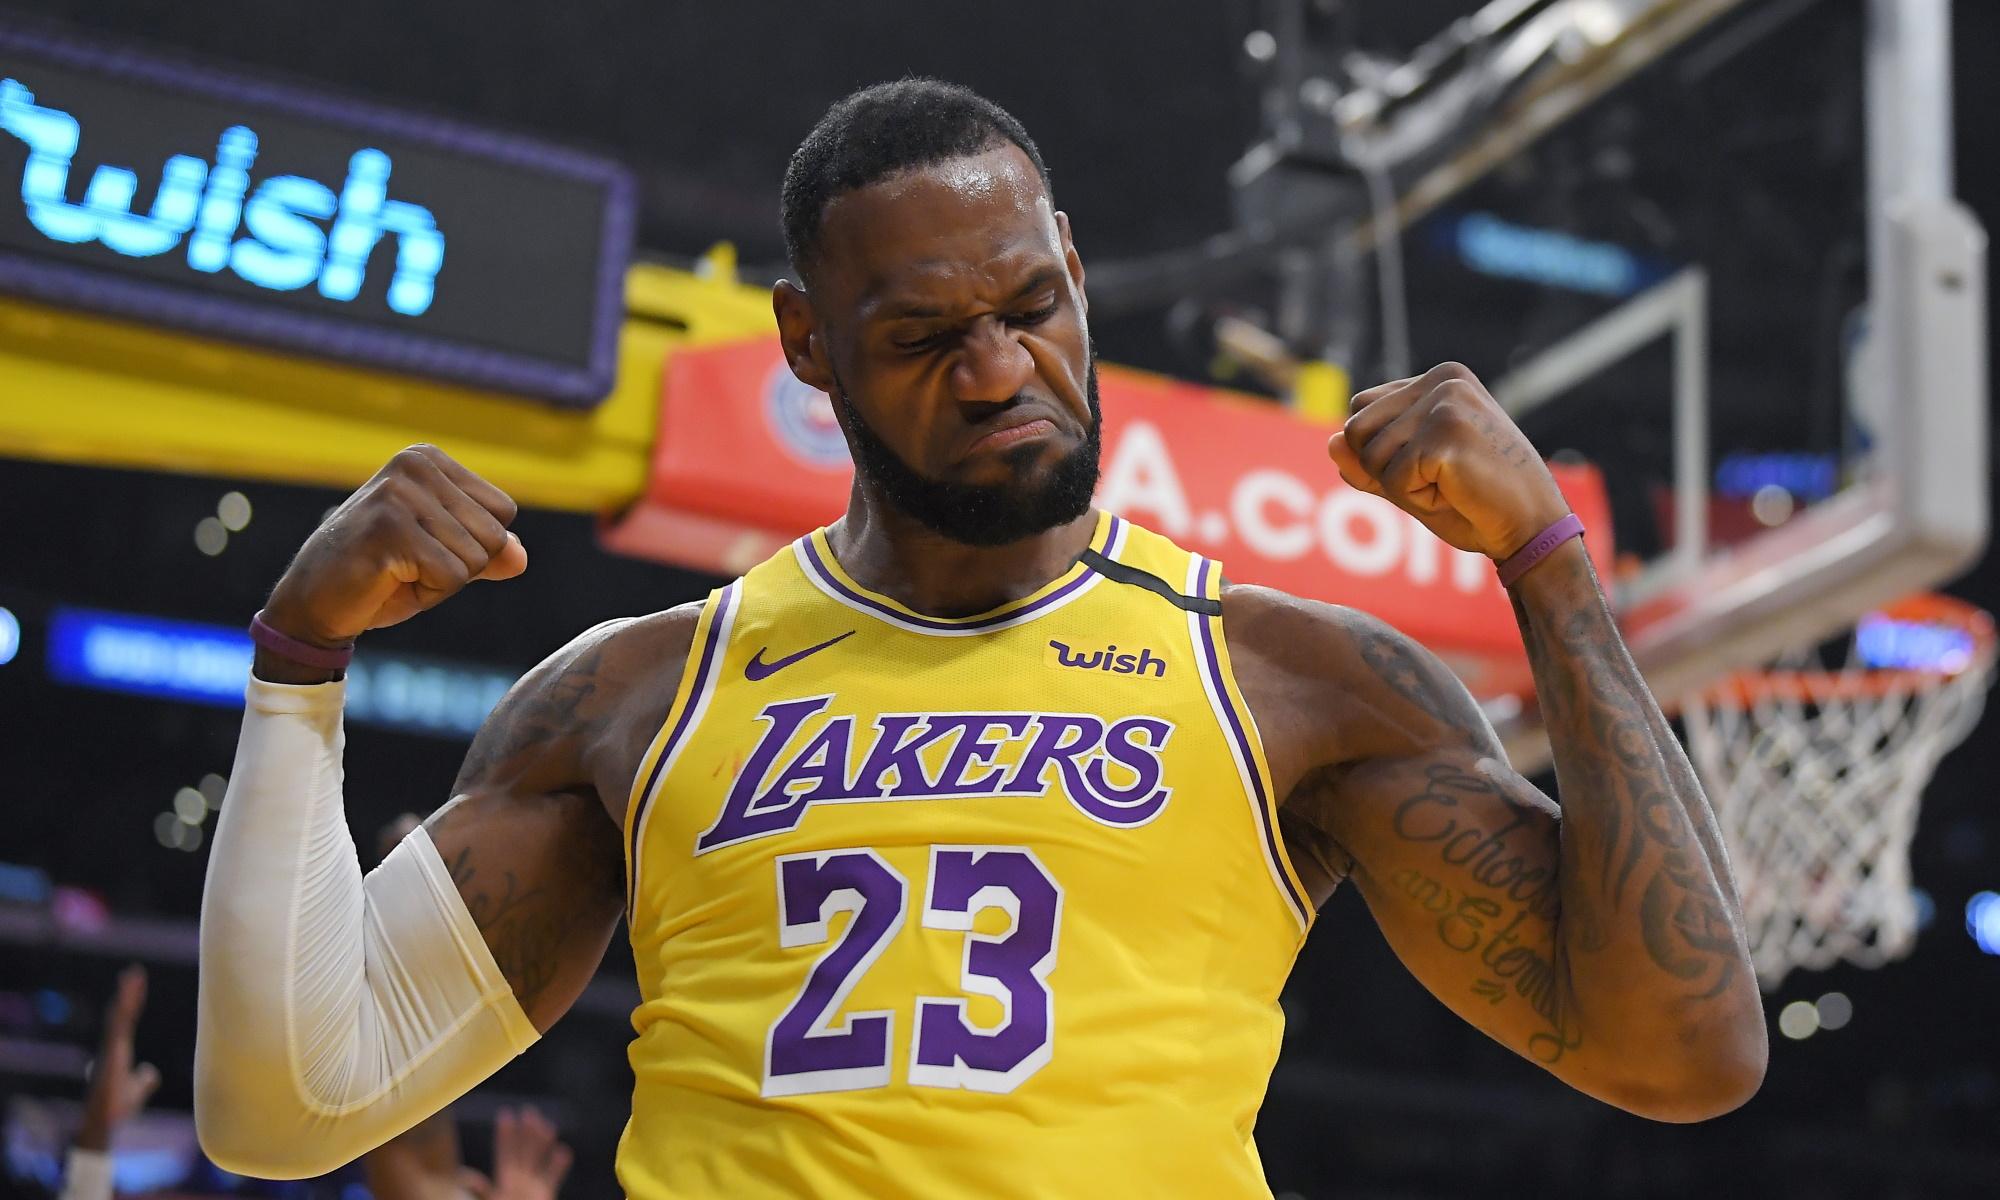 LeBron James, Los Angeles Lakers vs New York Knicks at STAPLES Center